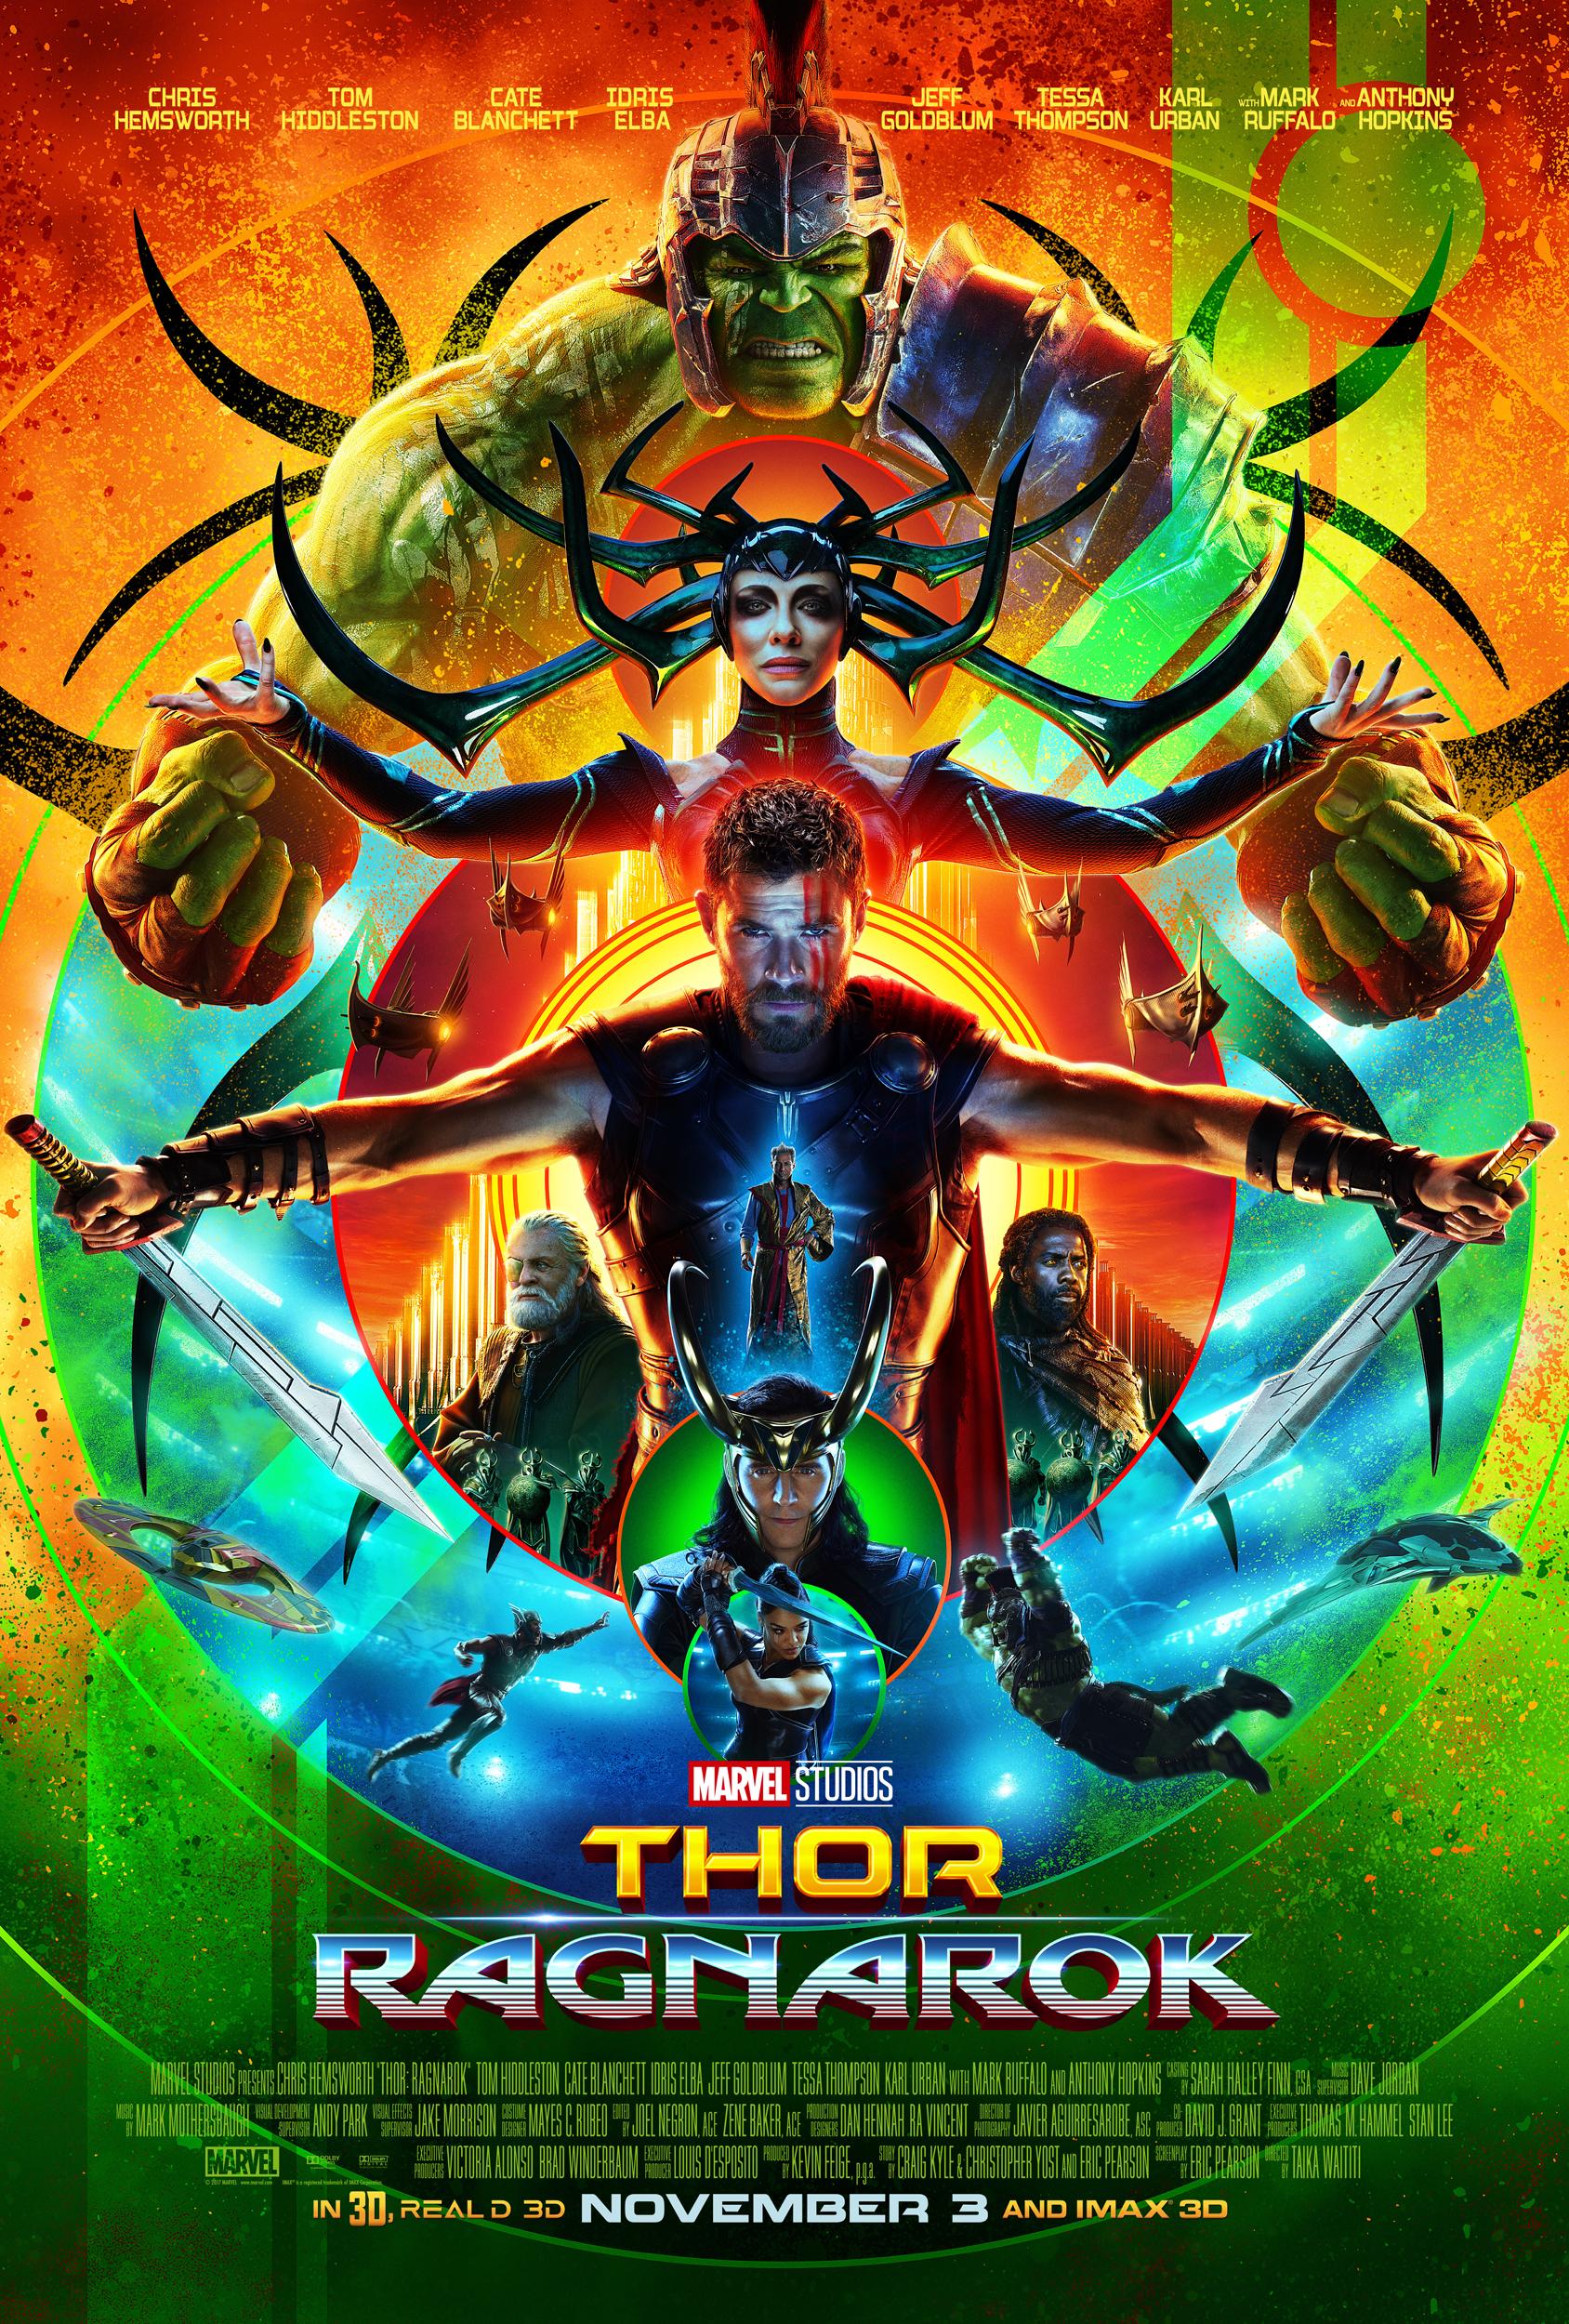 póster de la película Thor, Ragnarok